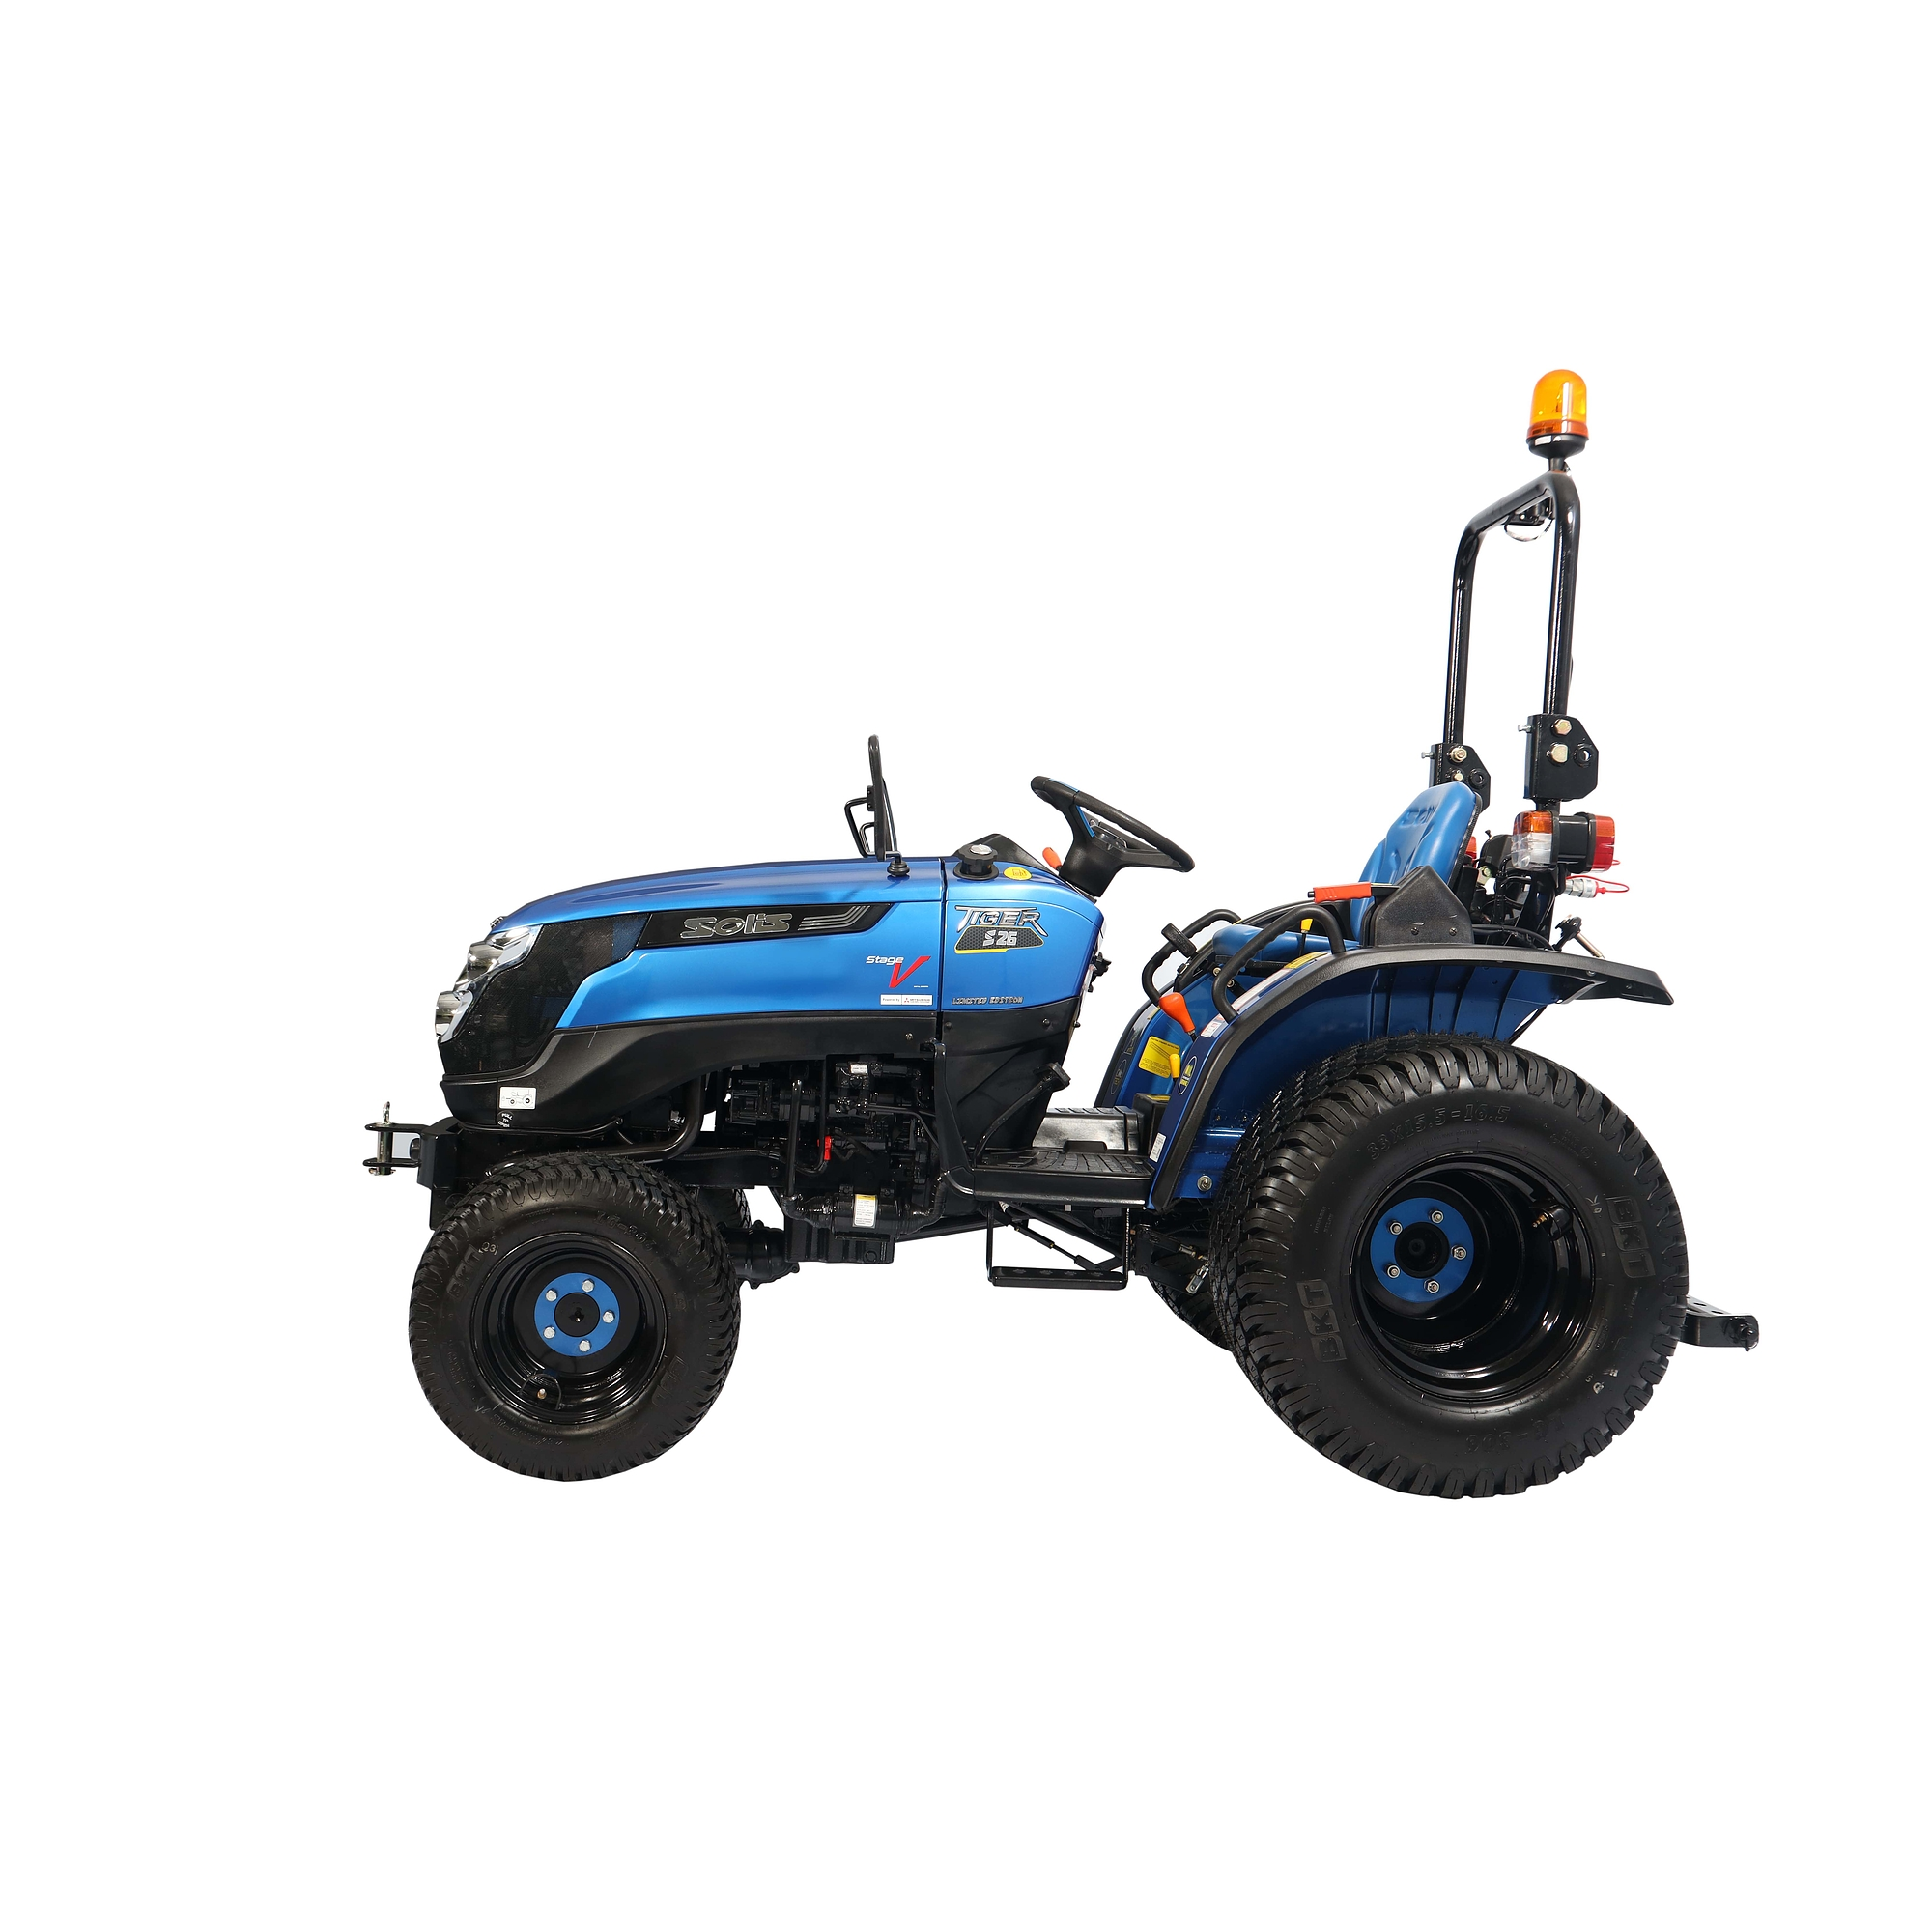 solis-26-limited-edition-traktor-4